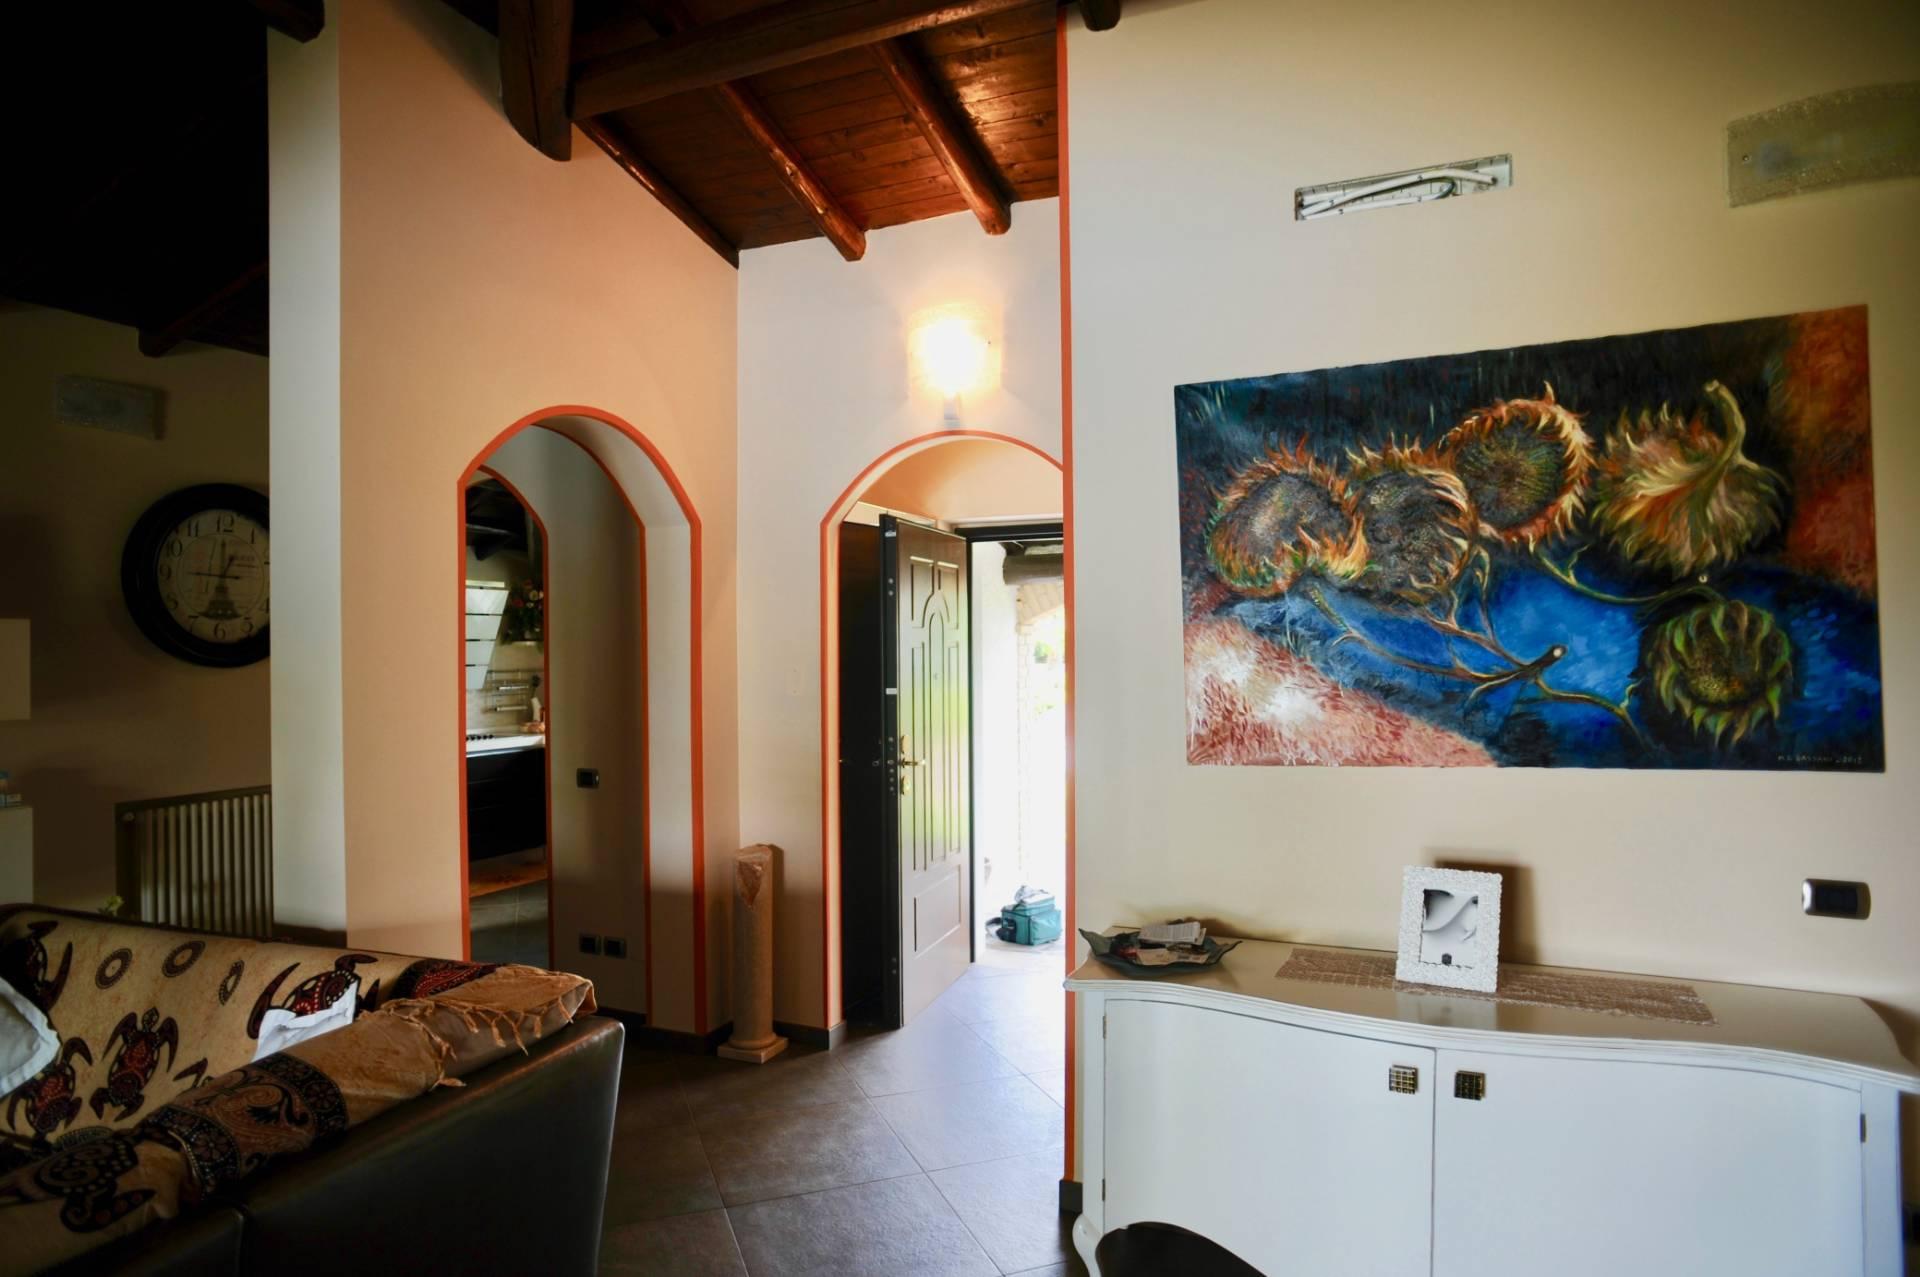 Villa in Vendita a Padenghe Sul Garda: 3 locali, 100 mq - Foto 12